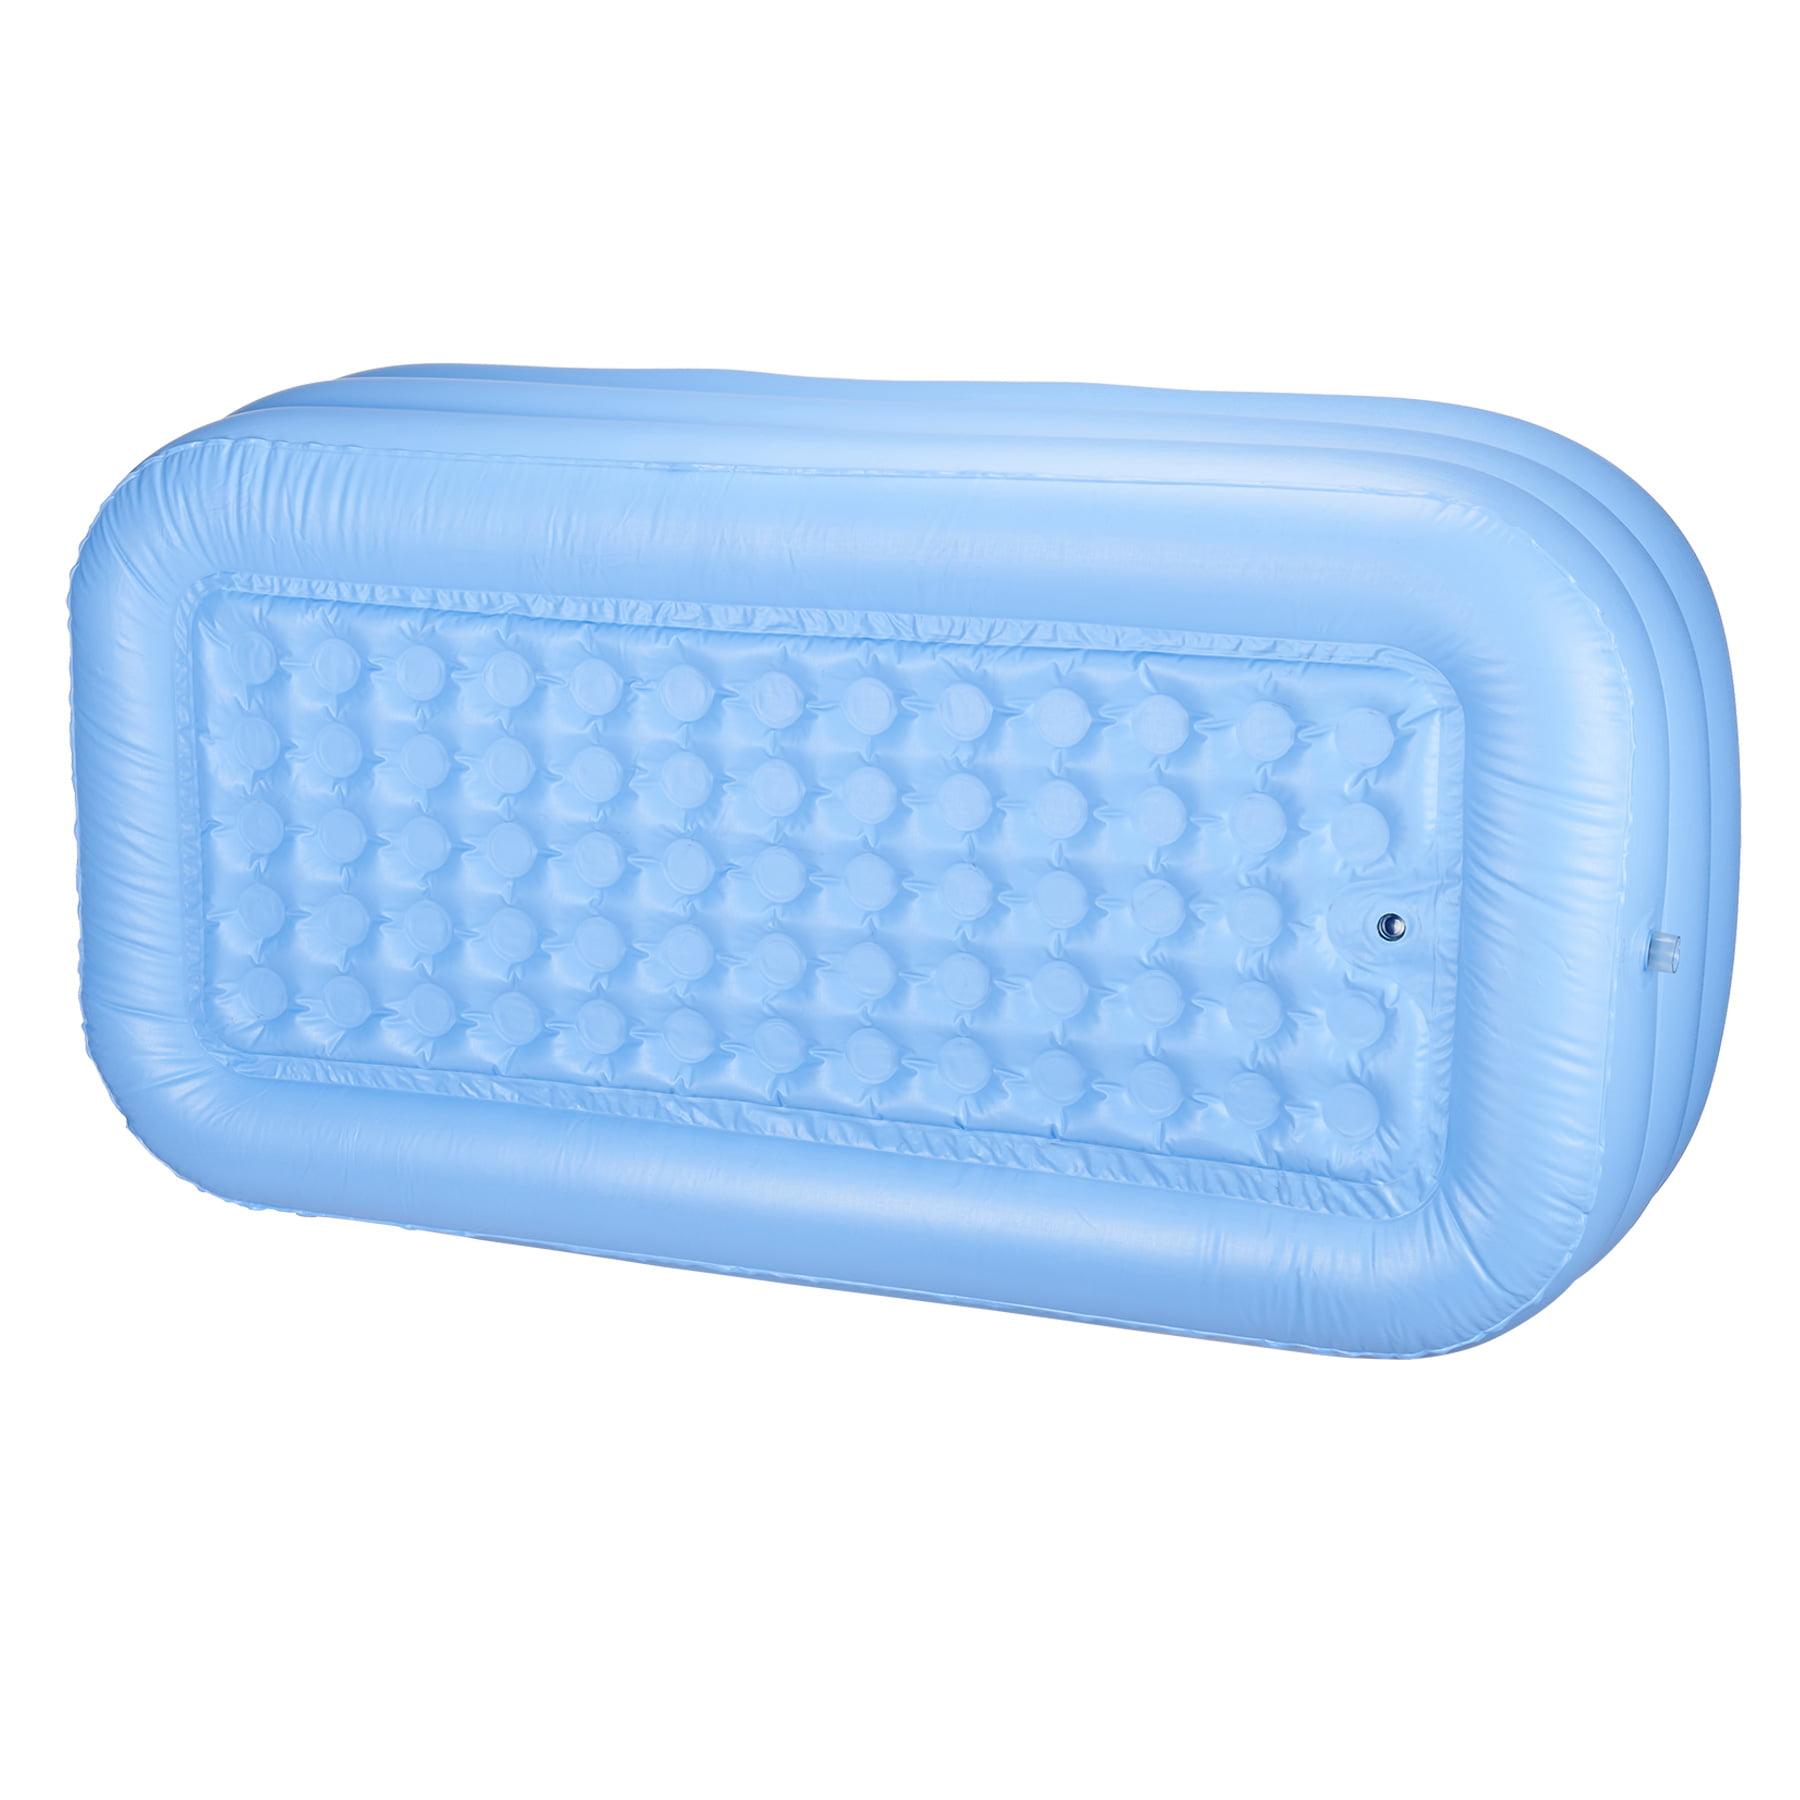 CO-Z PVC Inflatable Spa Bathtub Kit Adult Size - Walmart.com